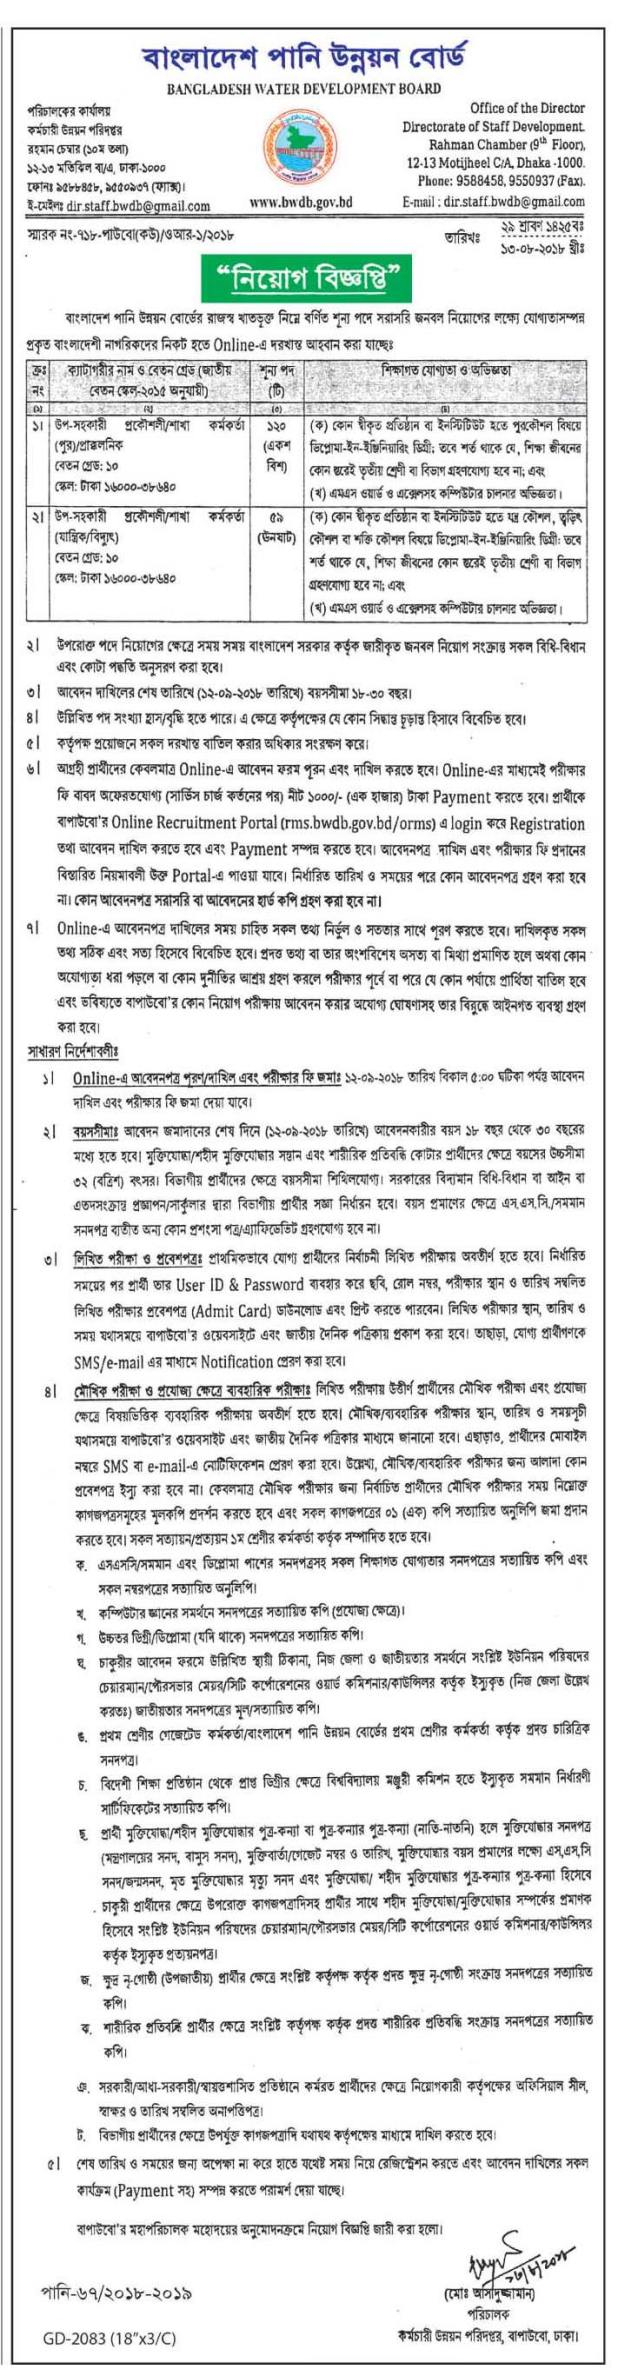 Bangladesh Water Development Board Job circular 2018.